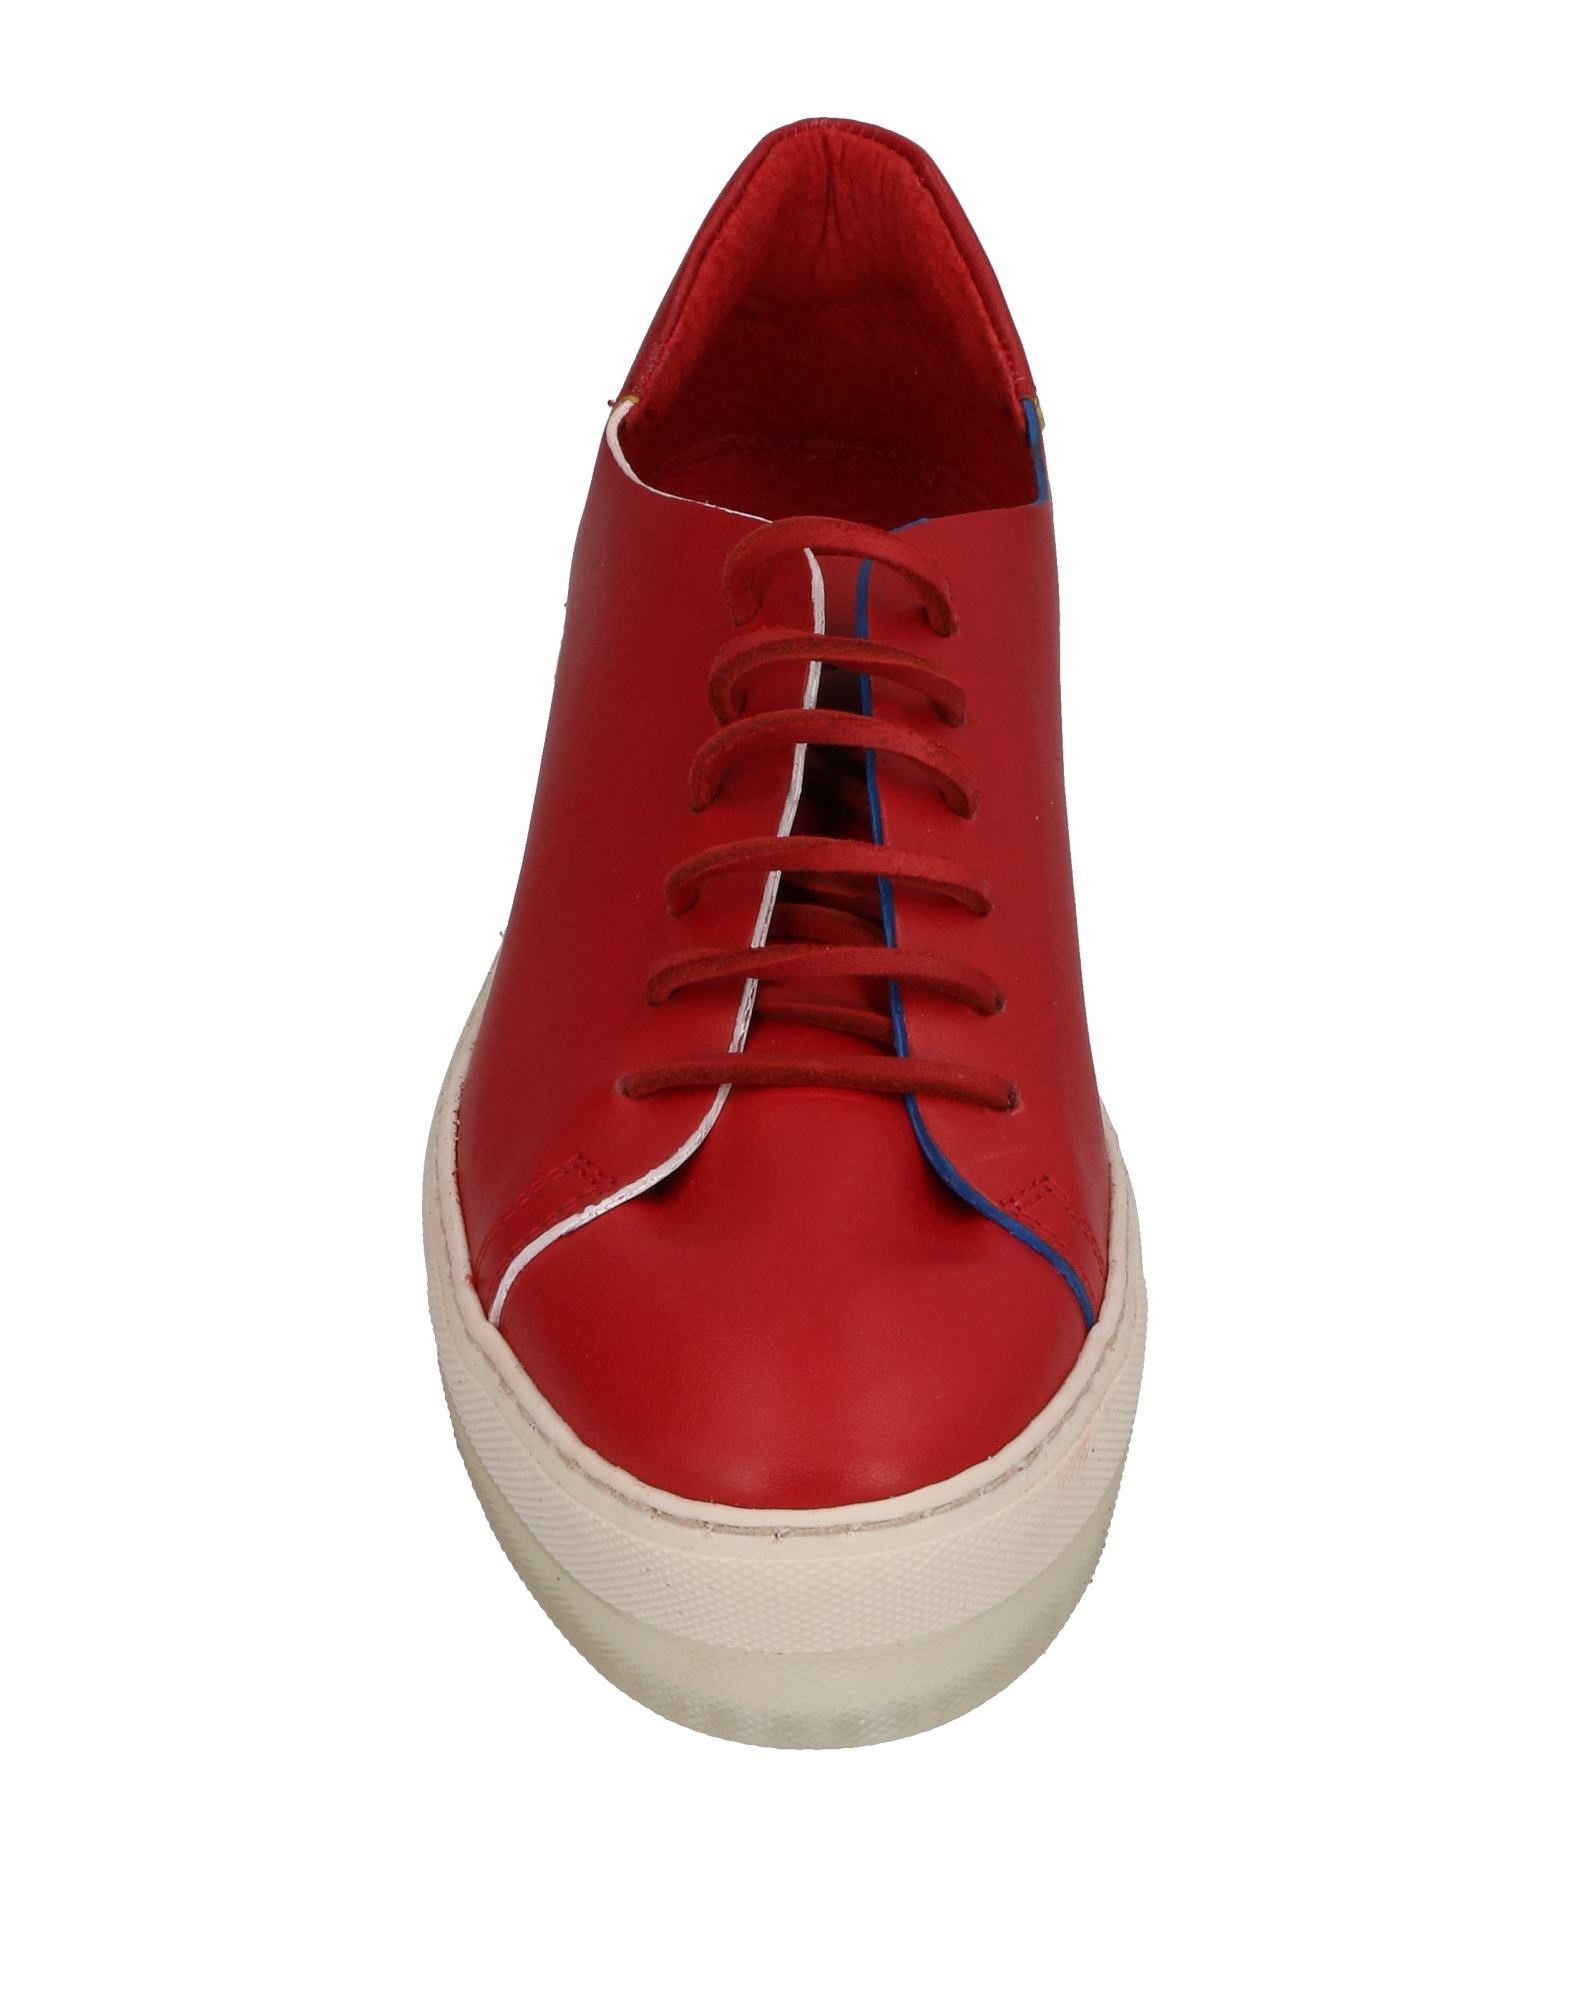 Diesel Gute Sneakers Damen  11423598PU Gute Diesel Qualität beliebte Schuhe 3b9369